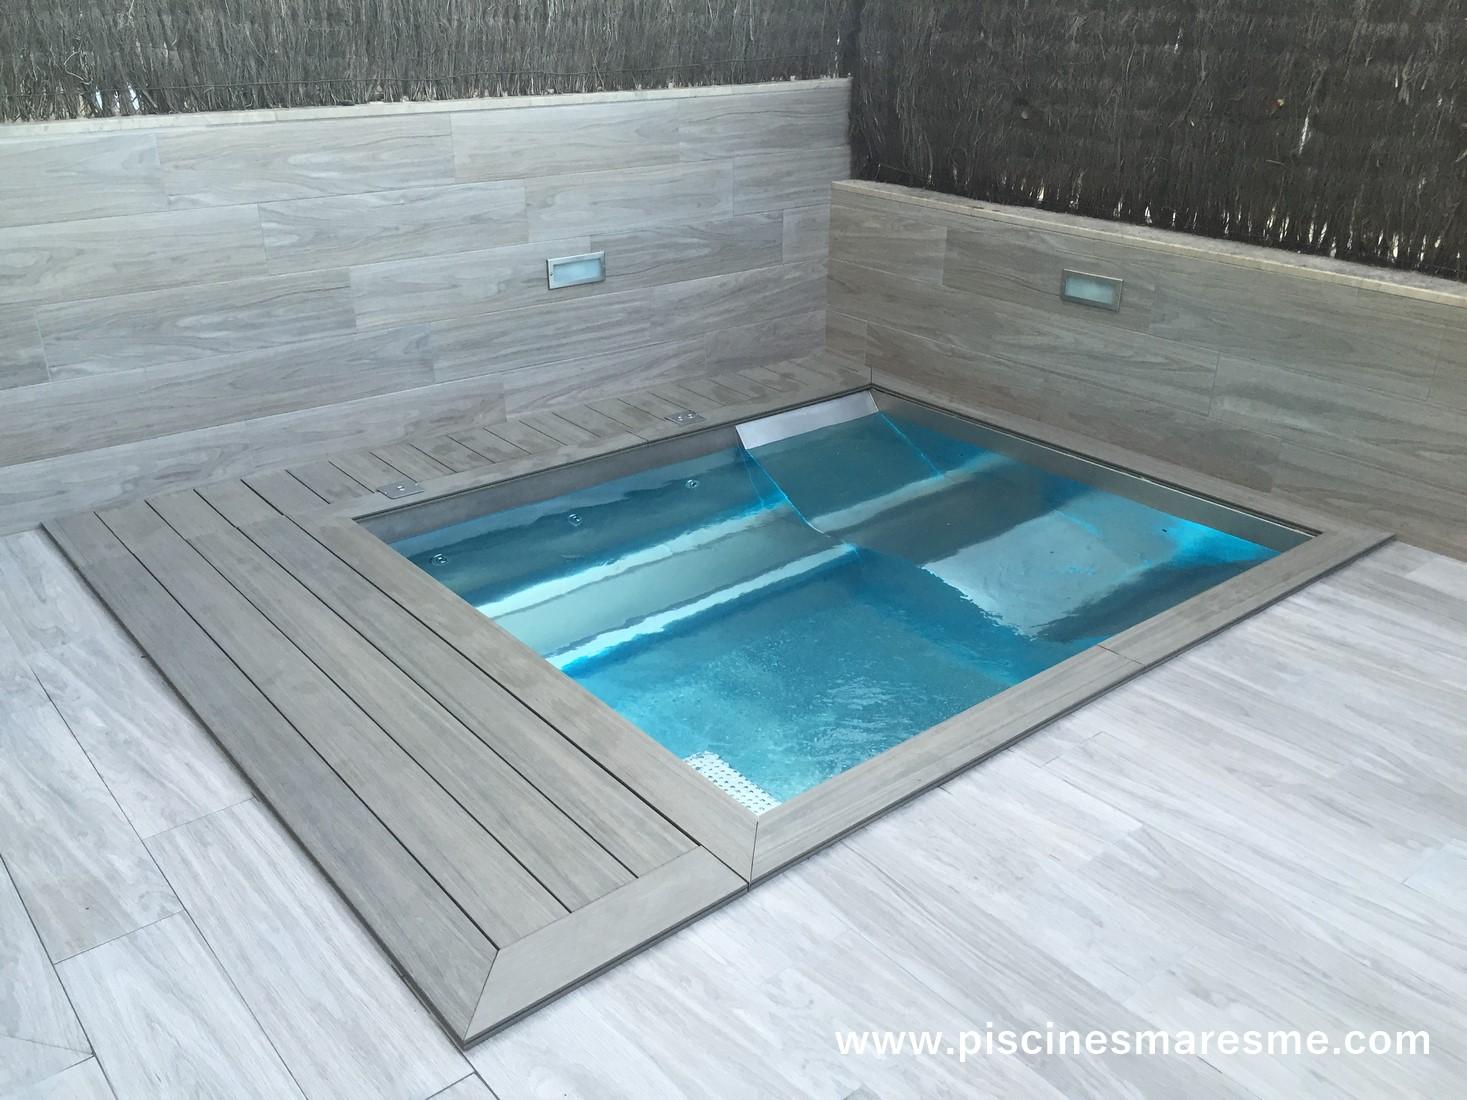 Piscinas de acero precios good piscinas toi with piscinas de acero precios piscinas de chapa - Piscinas gre carrefour ...